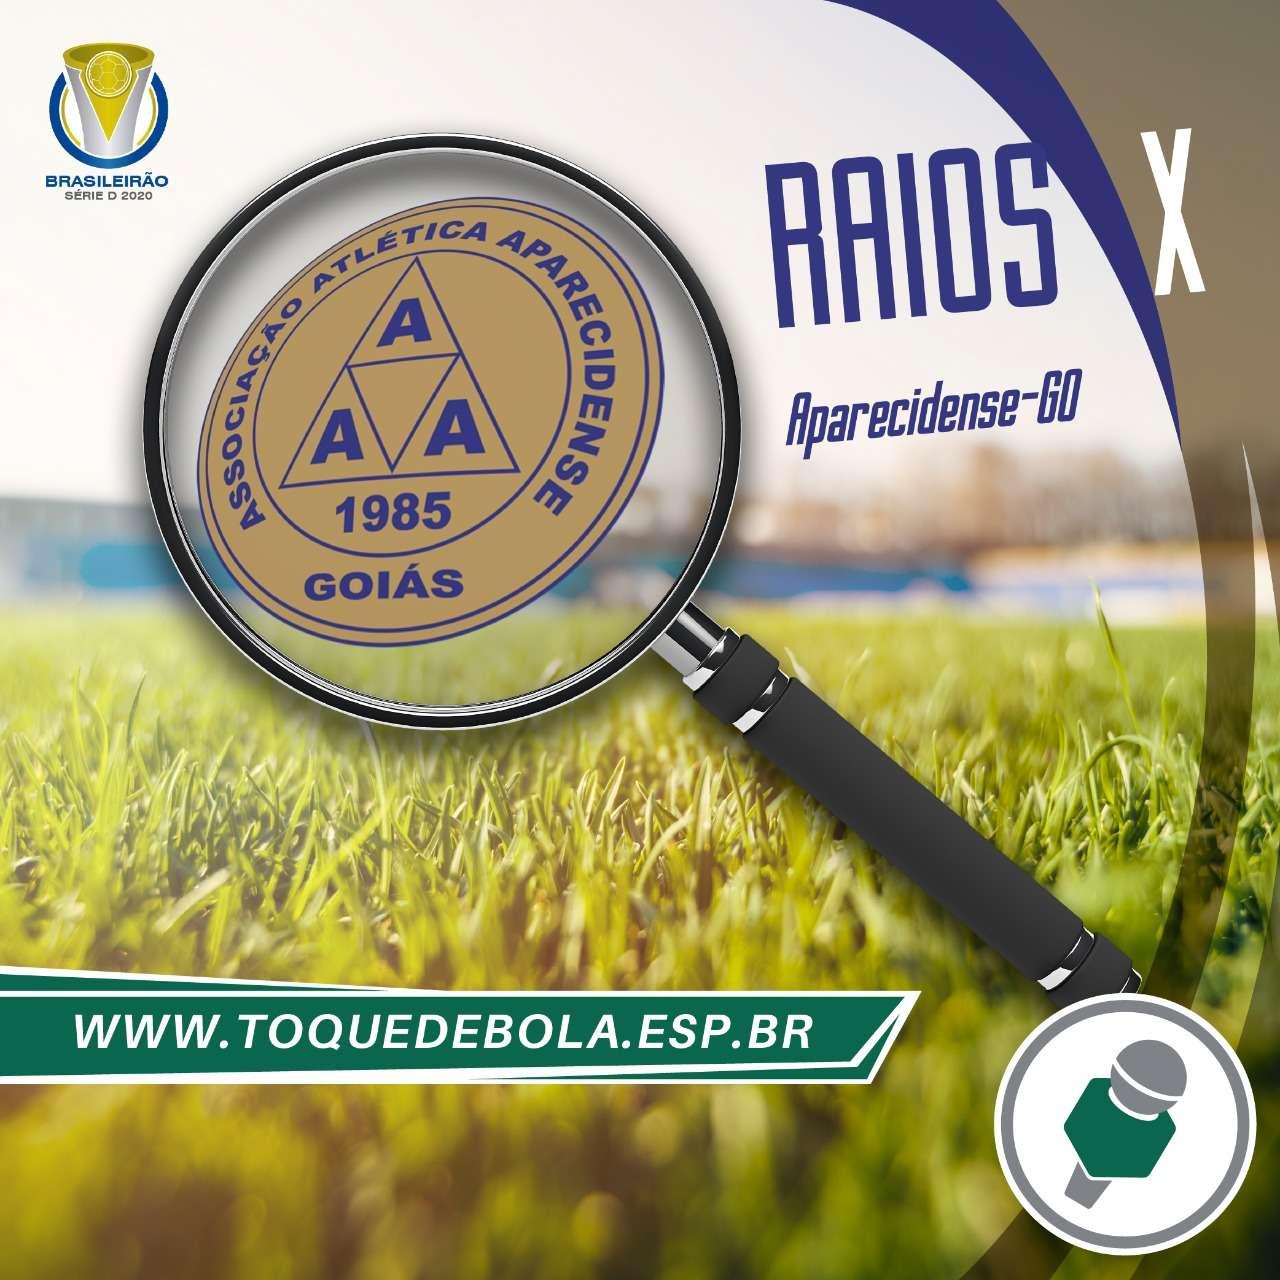 Read more about the article Raios-X: Aparecidense, próximo desafio do Tupynambás